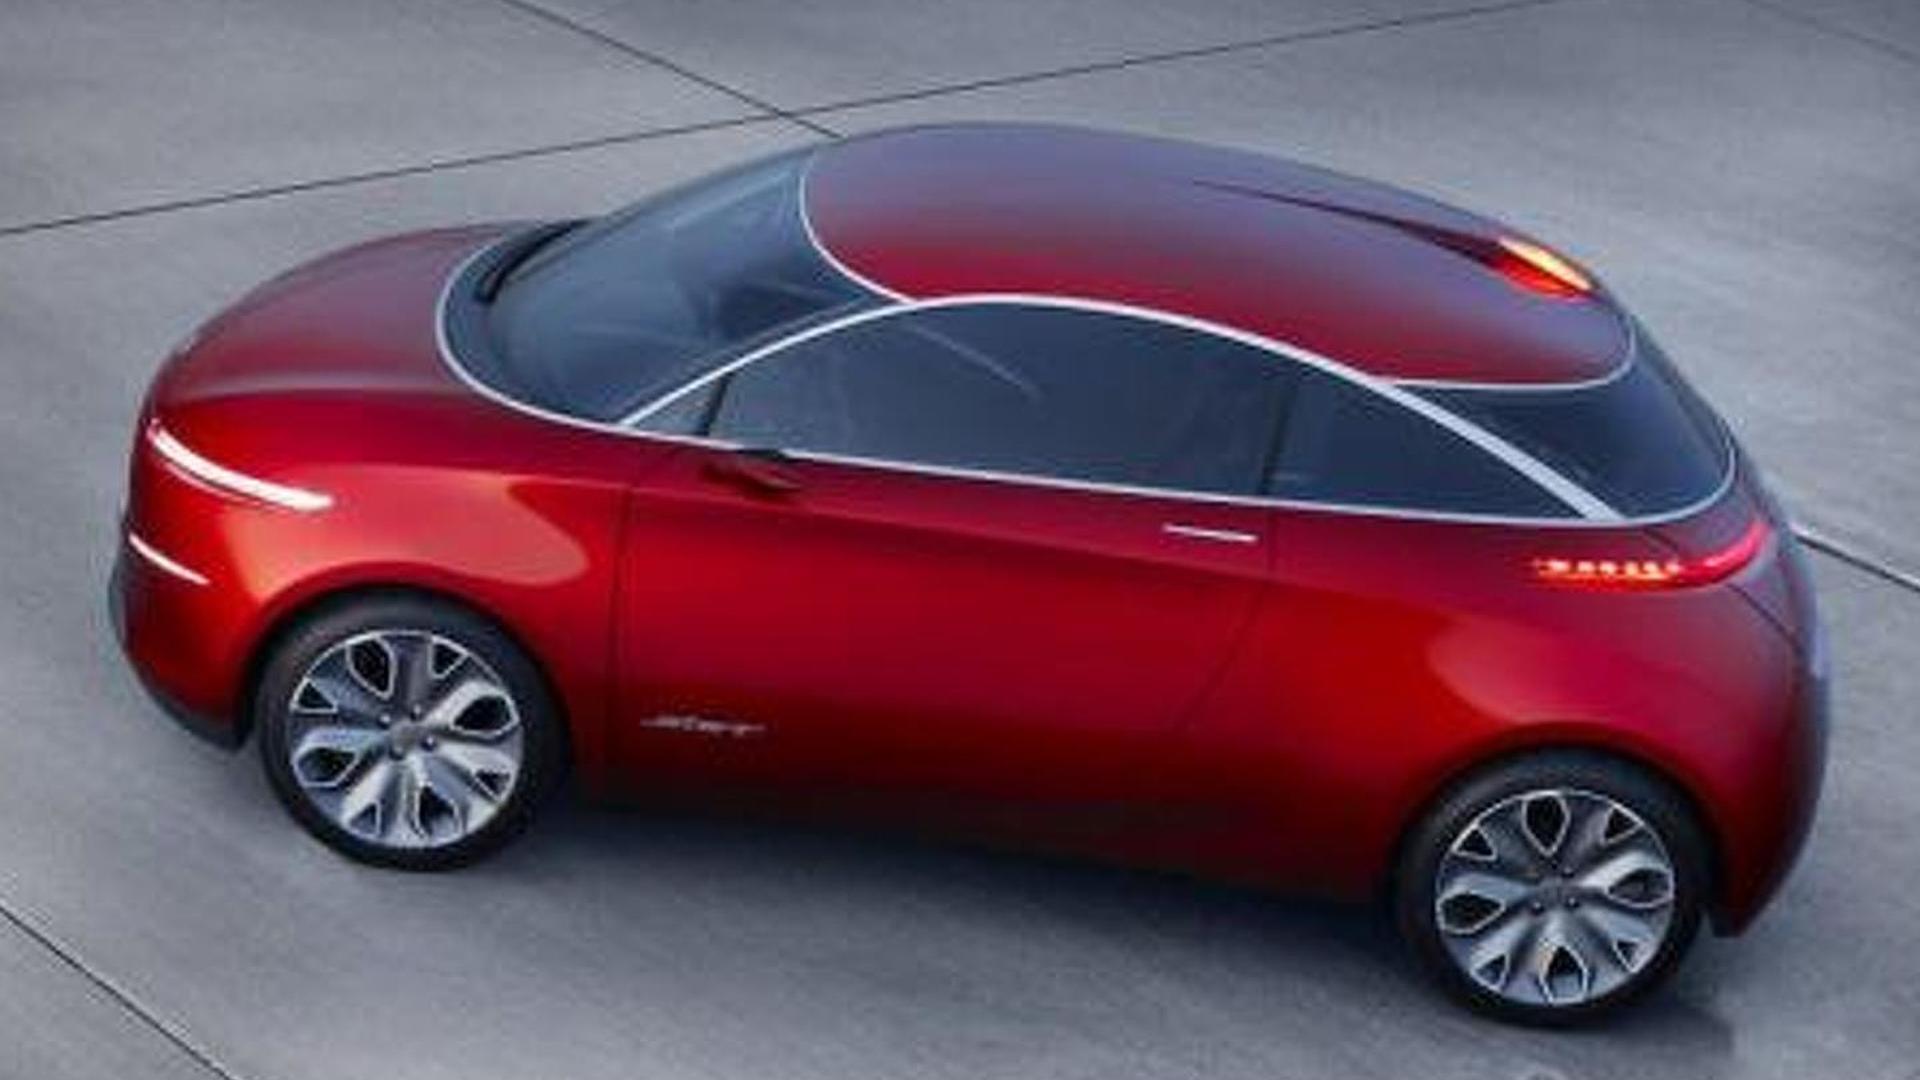 Ford Start Concept revealed with 3 cylinder EcoBoost engine